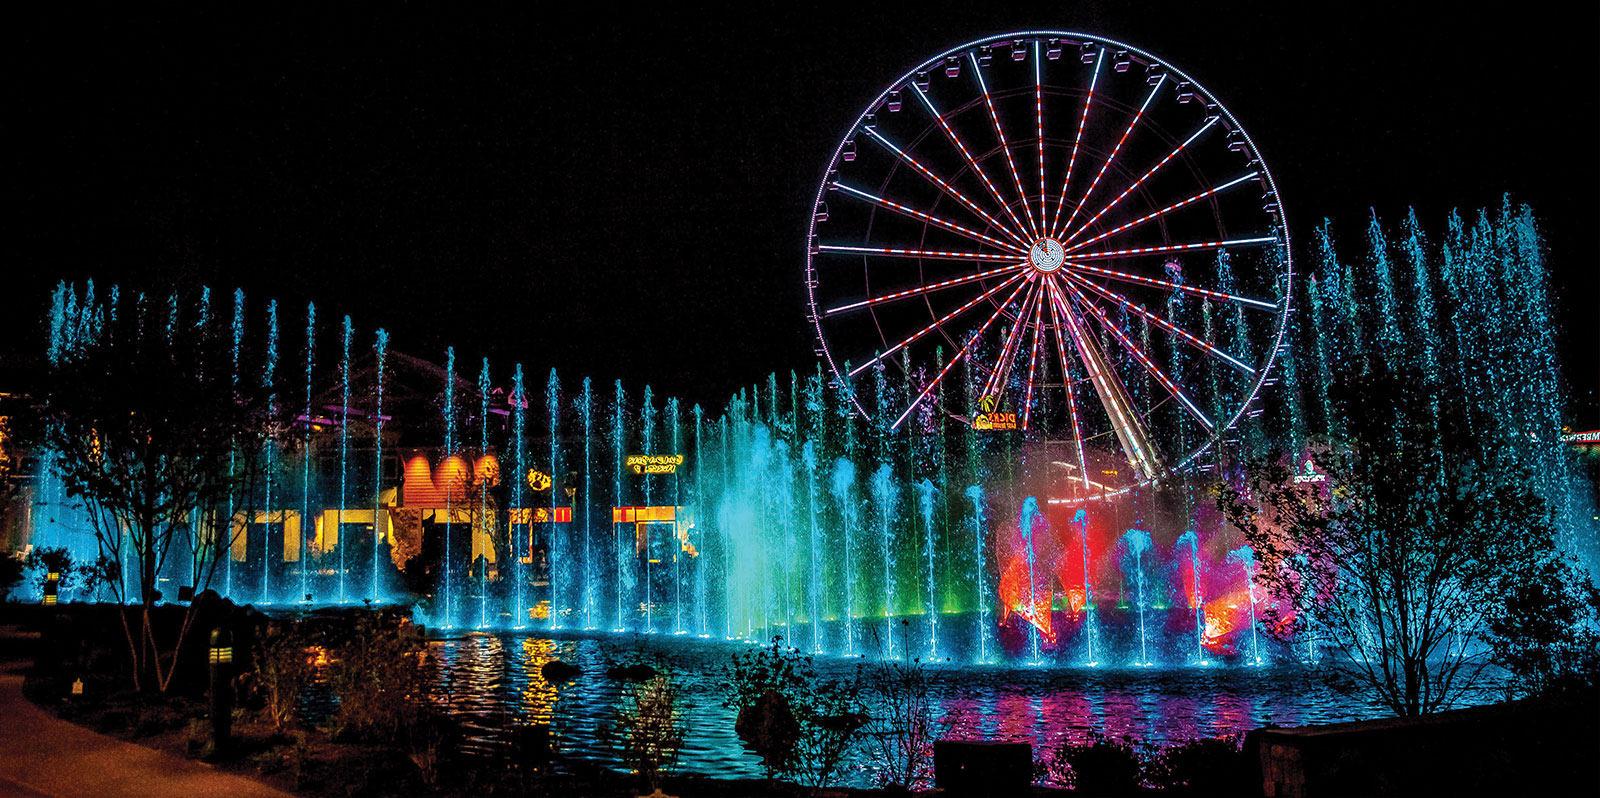 Contact Us  sc 1 st  Eworks Pro & E-Works Pro Amusement Ride LED Lighting - Contact Us azcodes.com